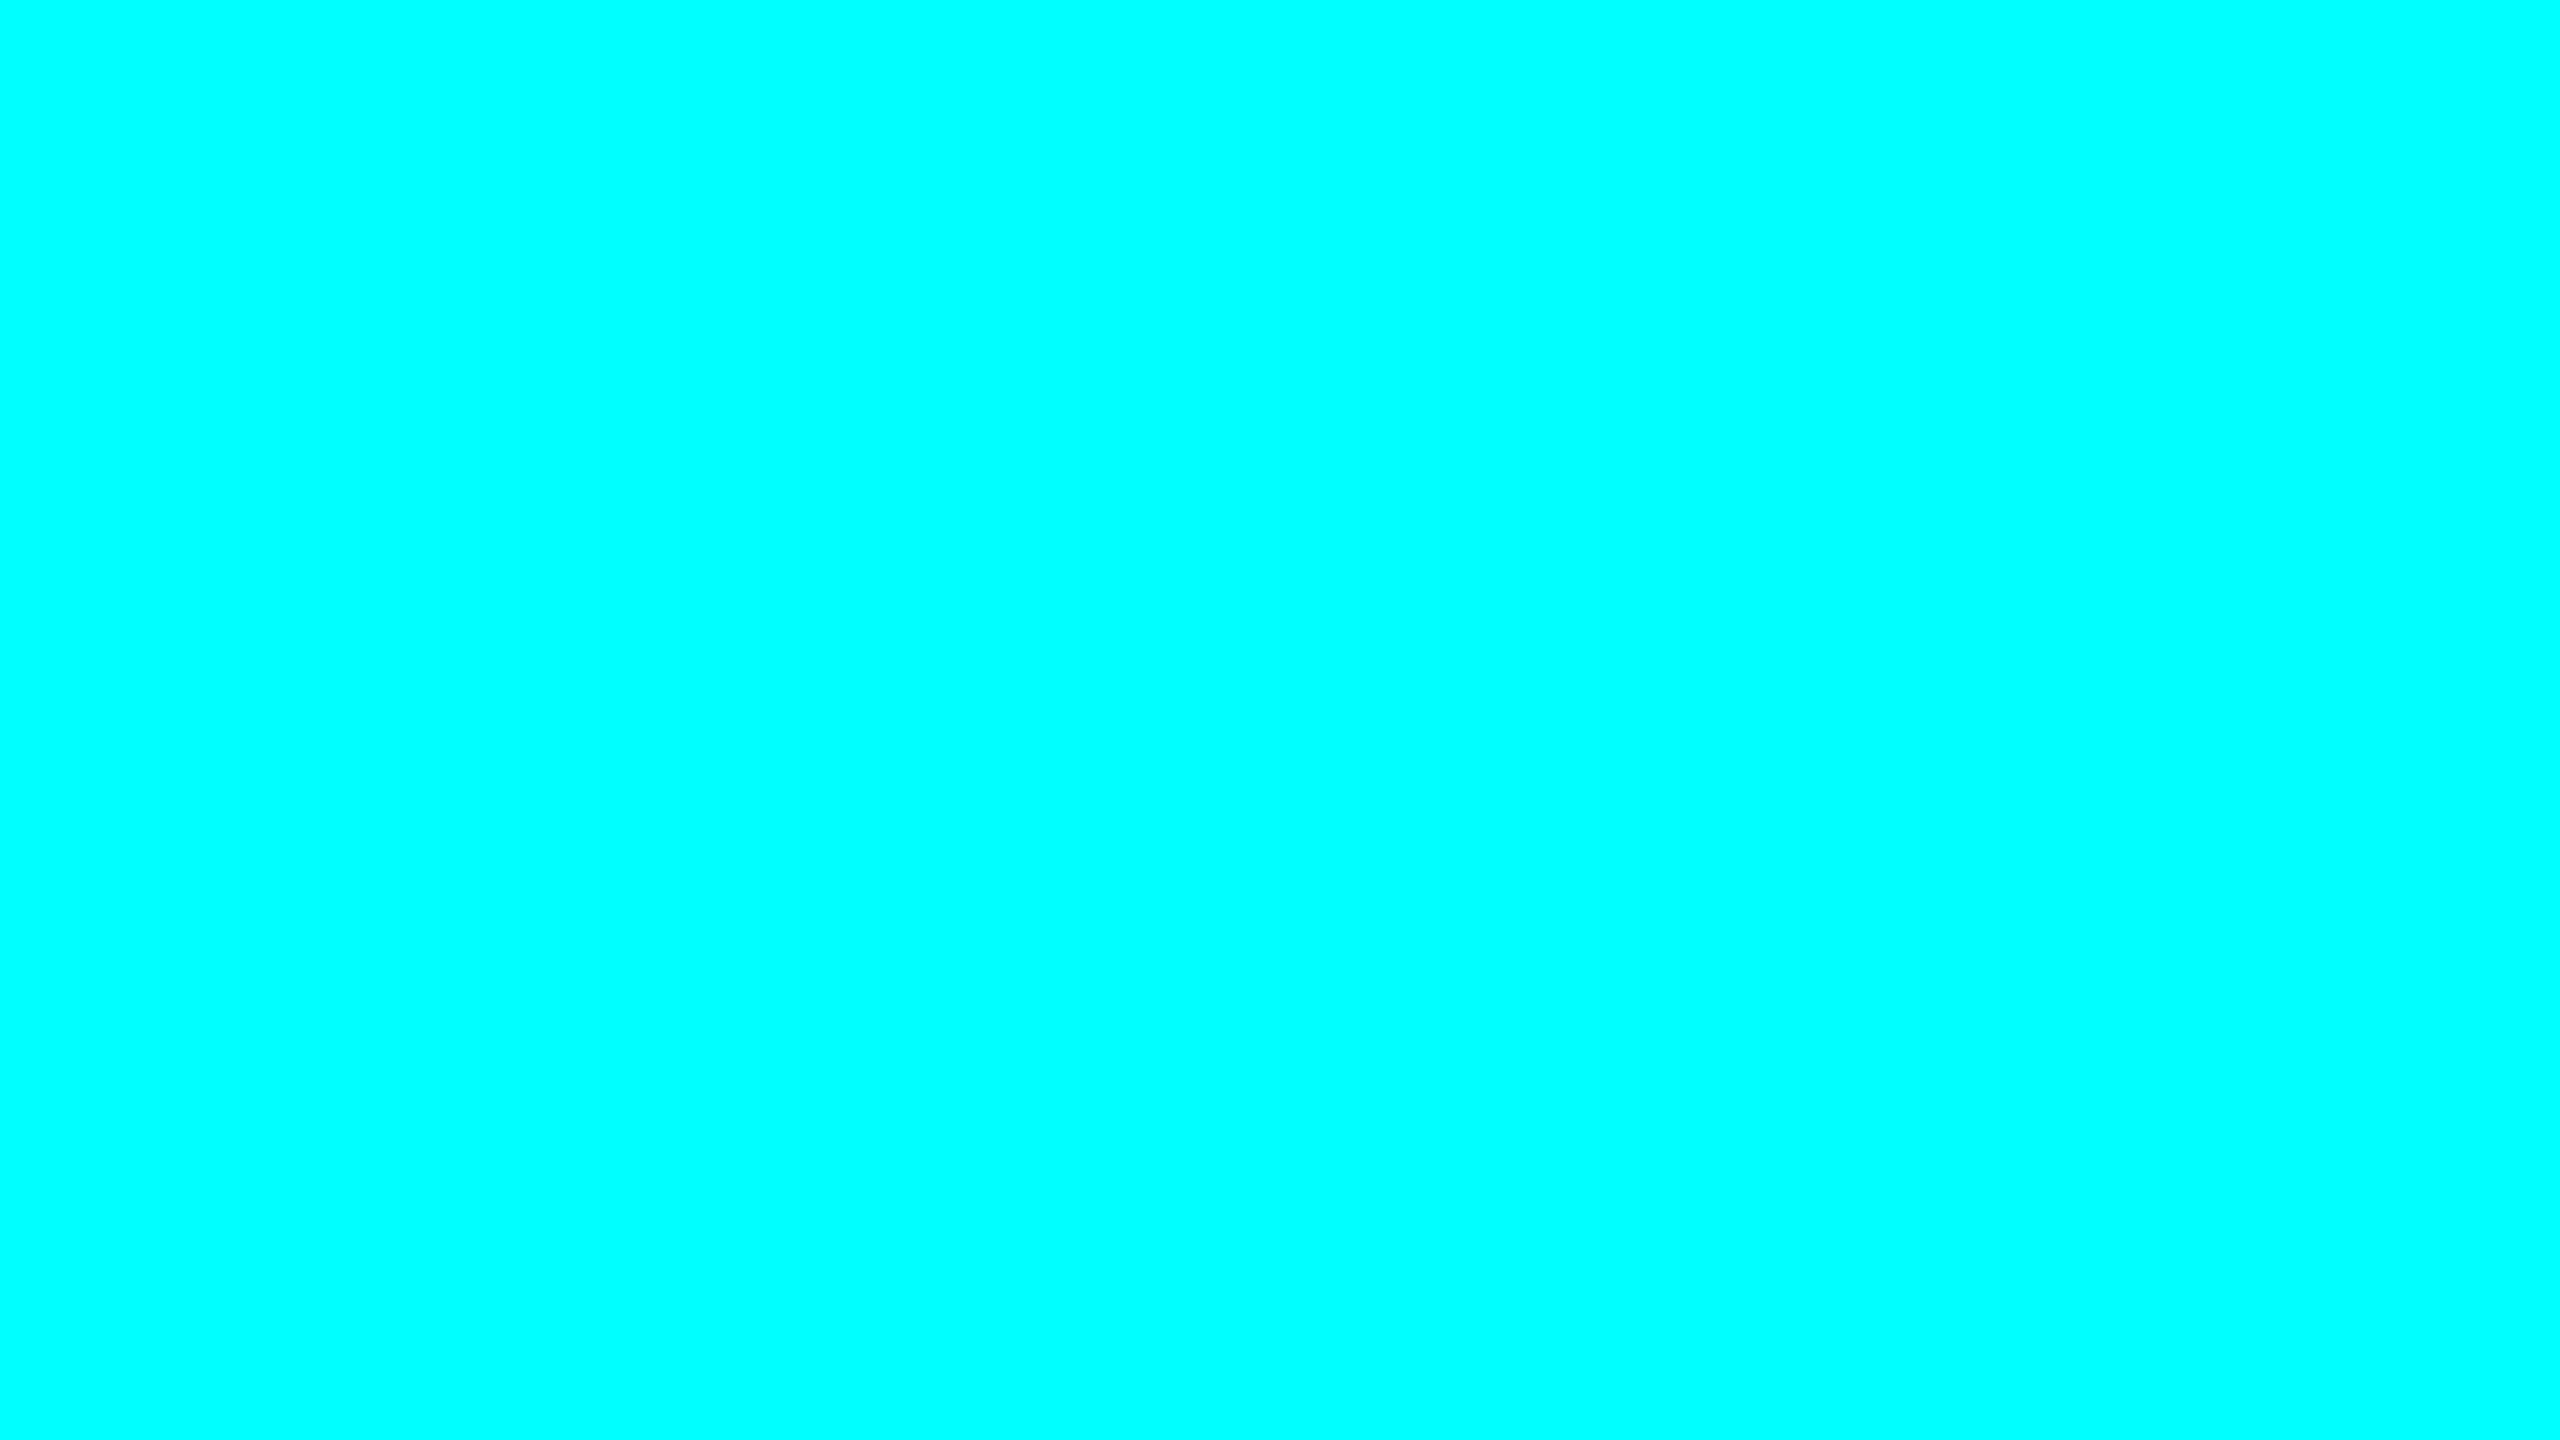 Cyan Desktop Wallpaper Installing This Is Easy 2560x1440